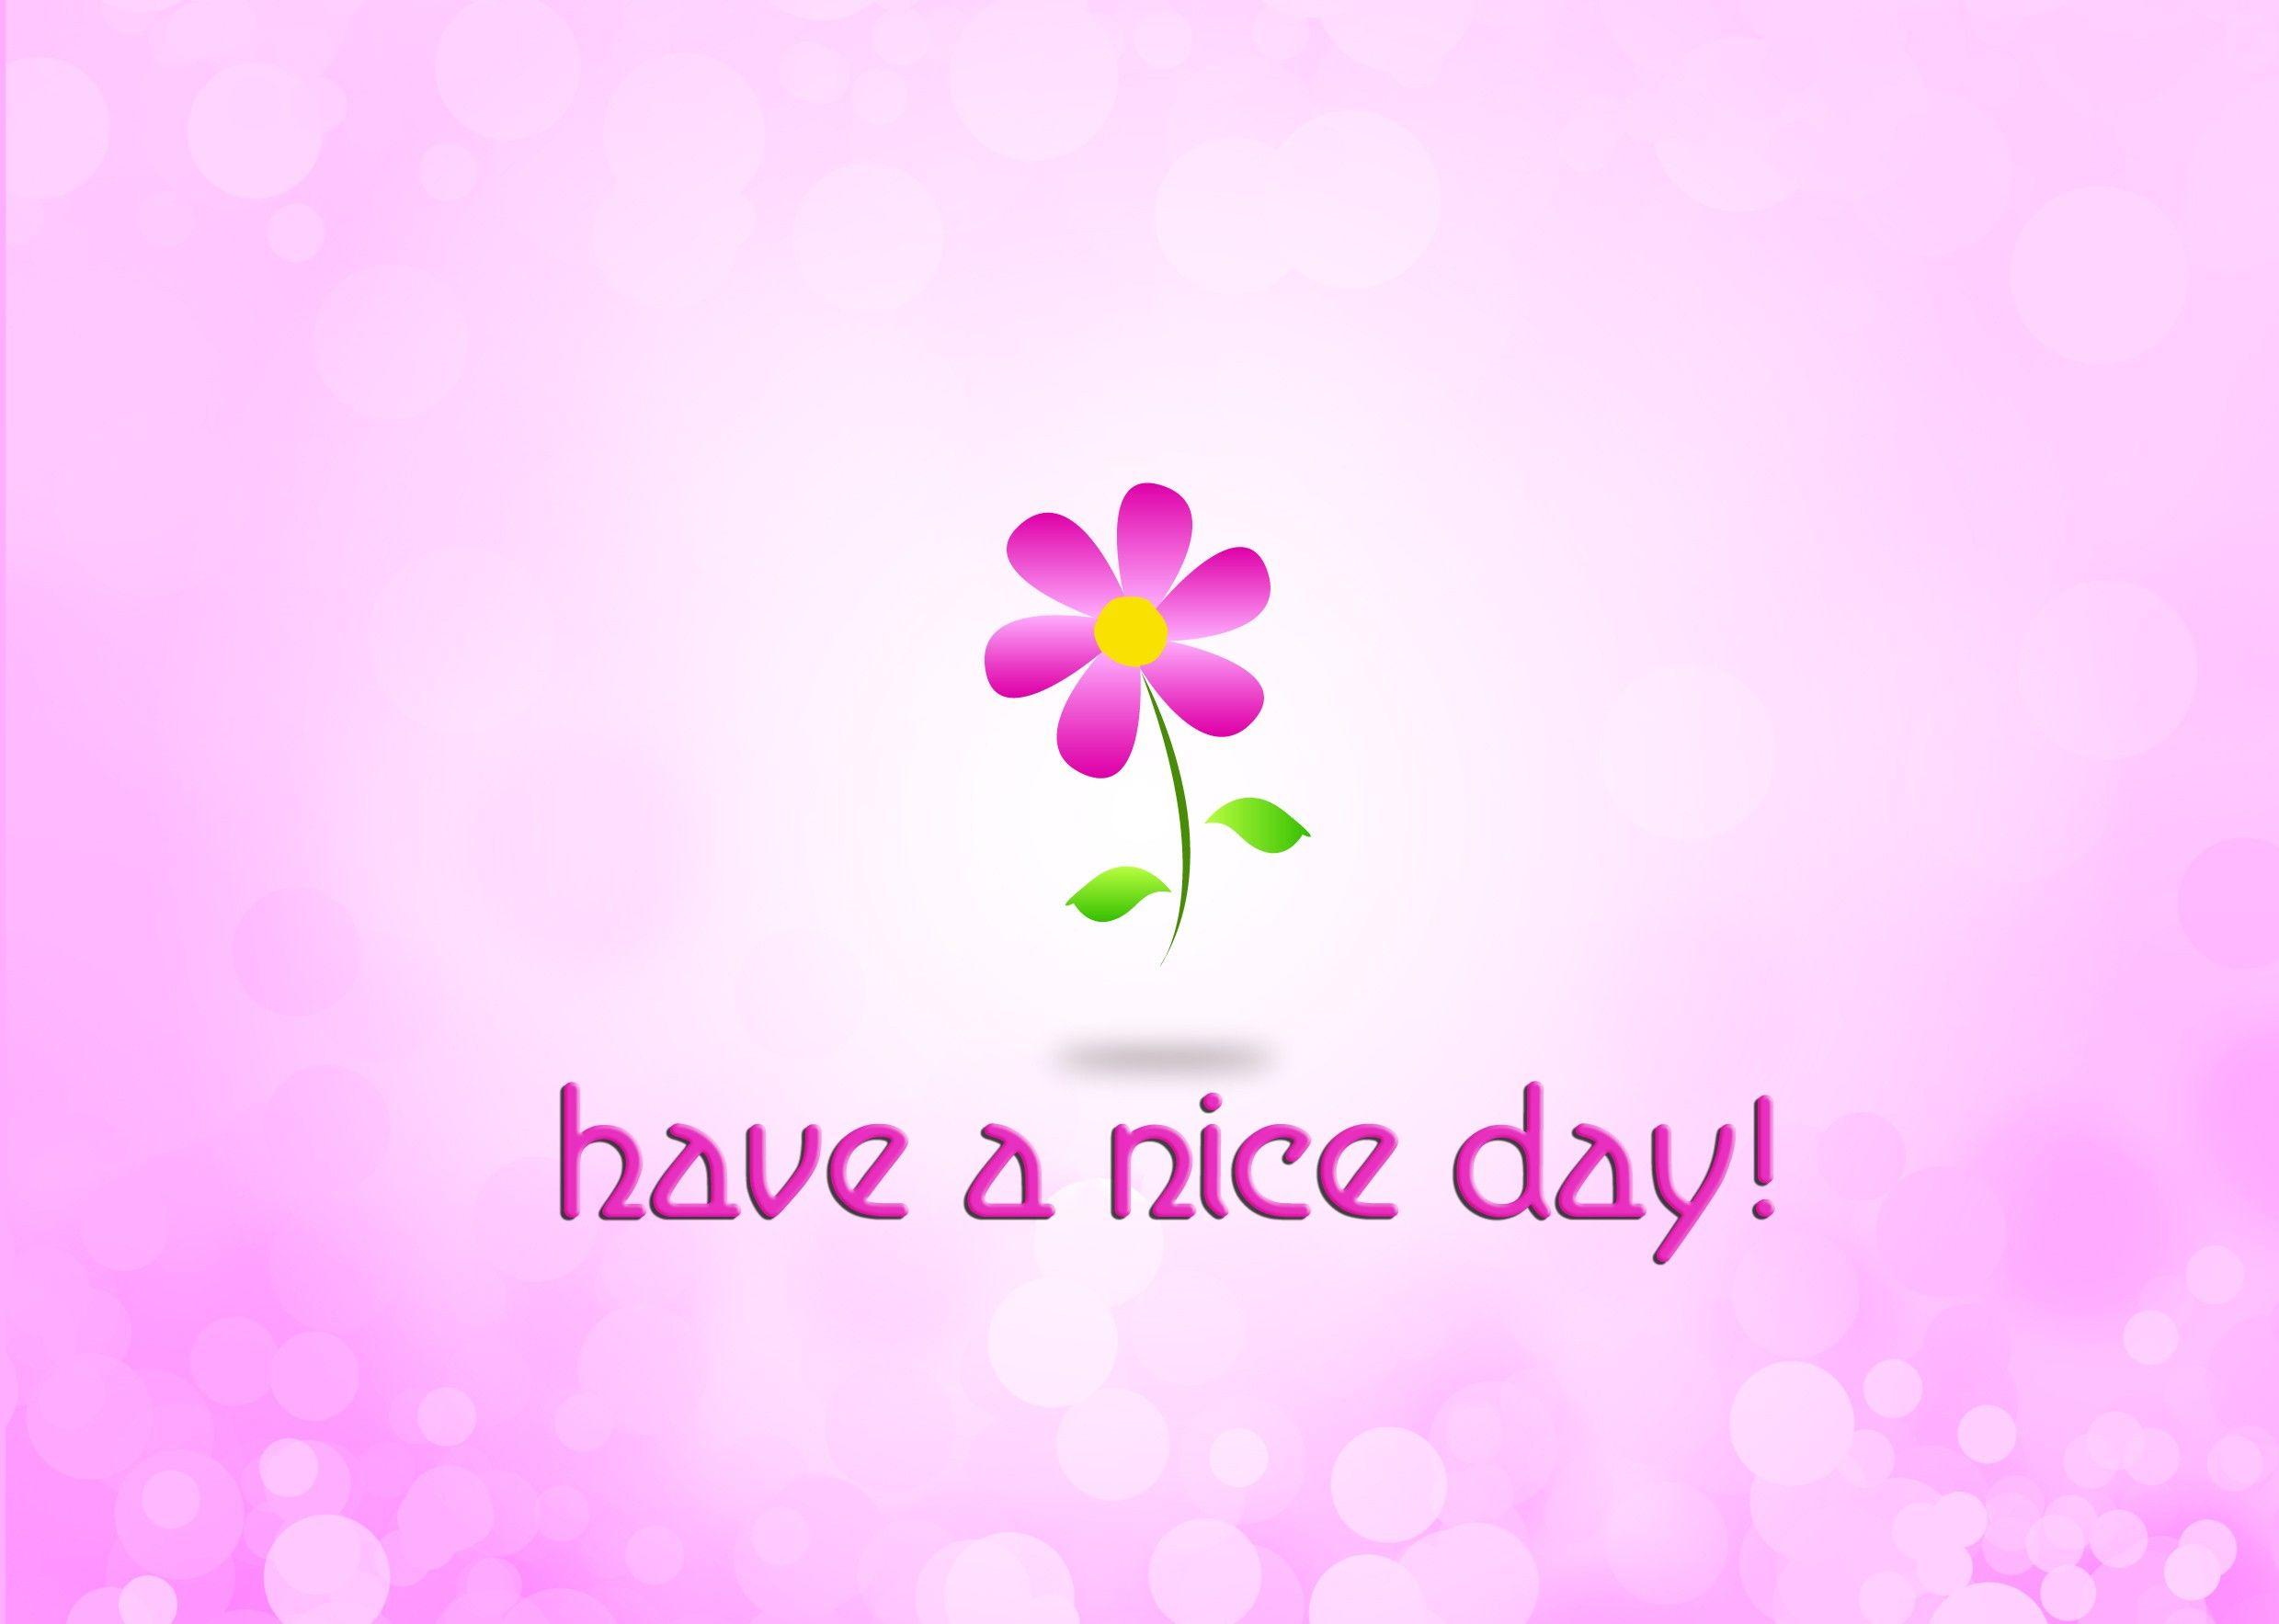 Bon Have A Nice Day!